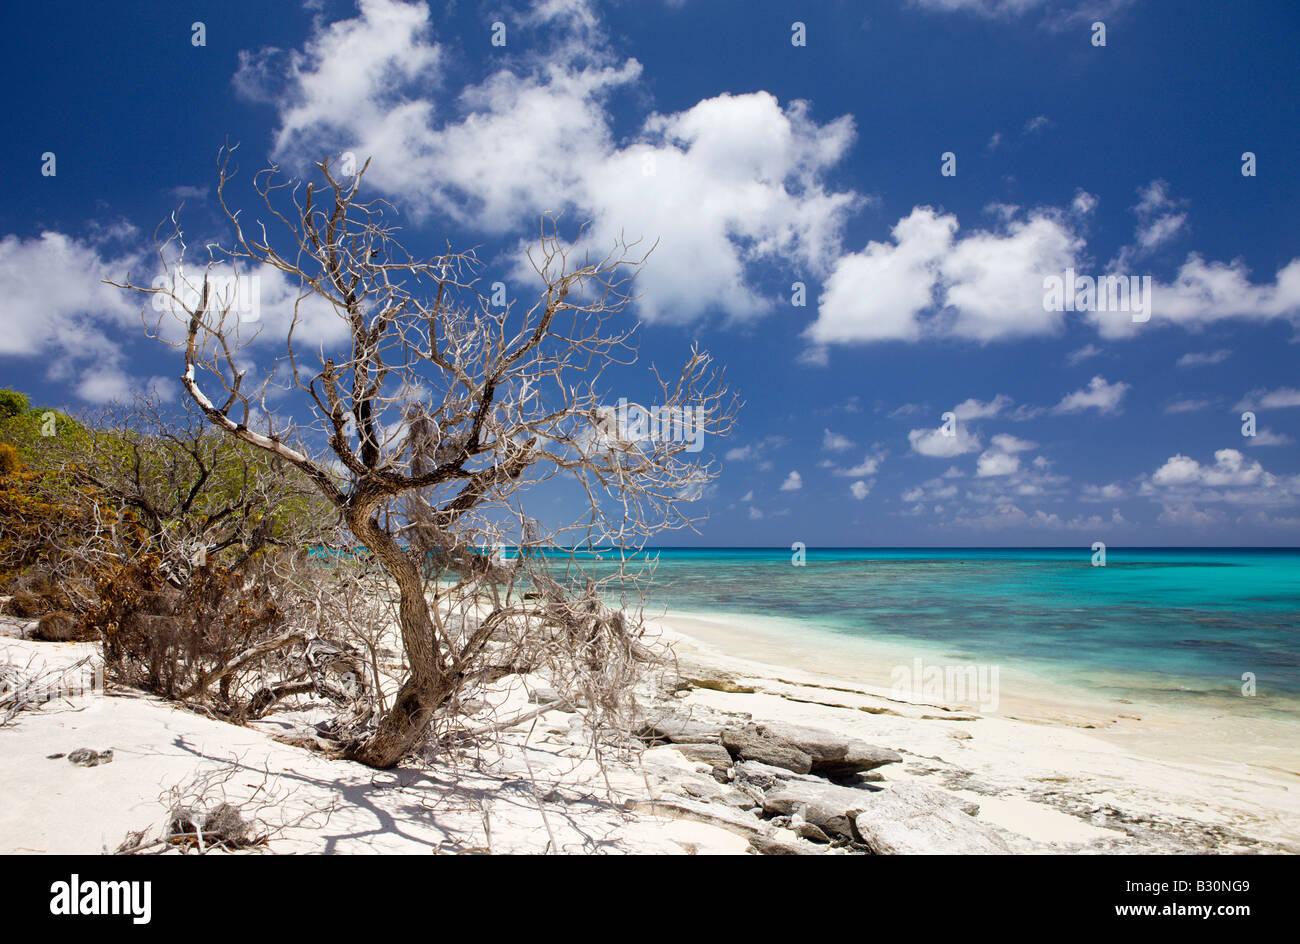 With Atoll of bikini still